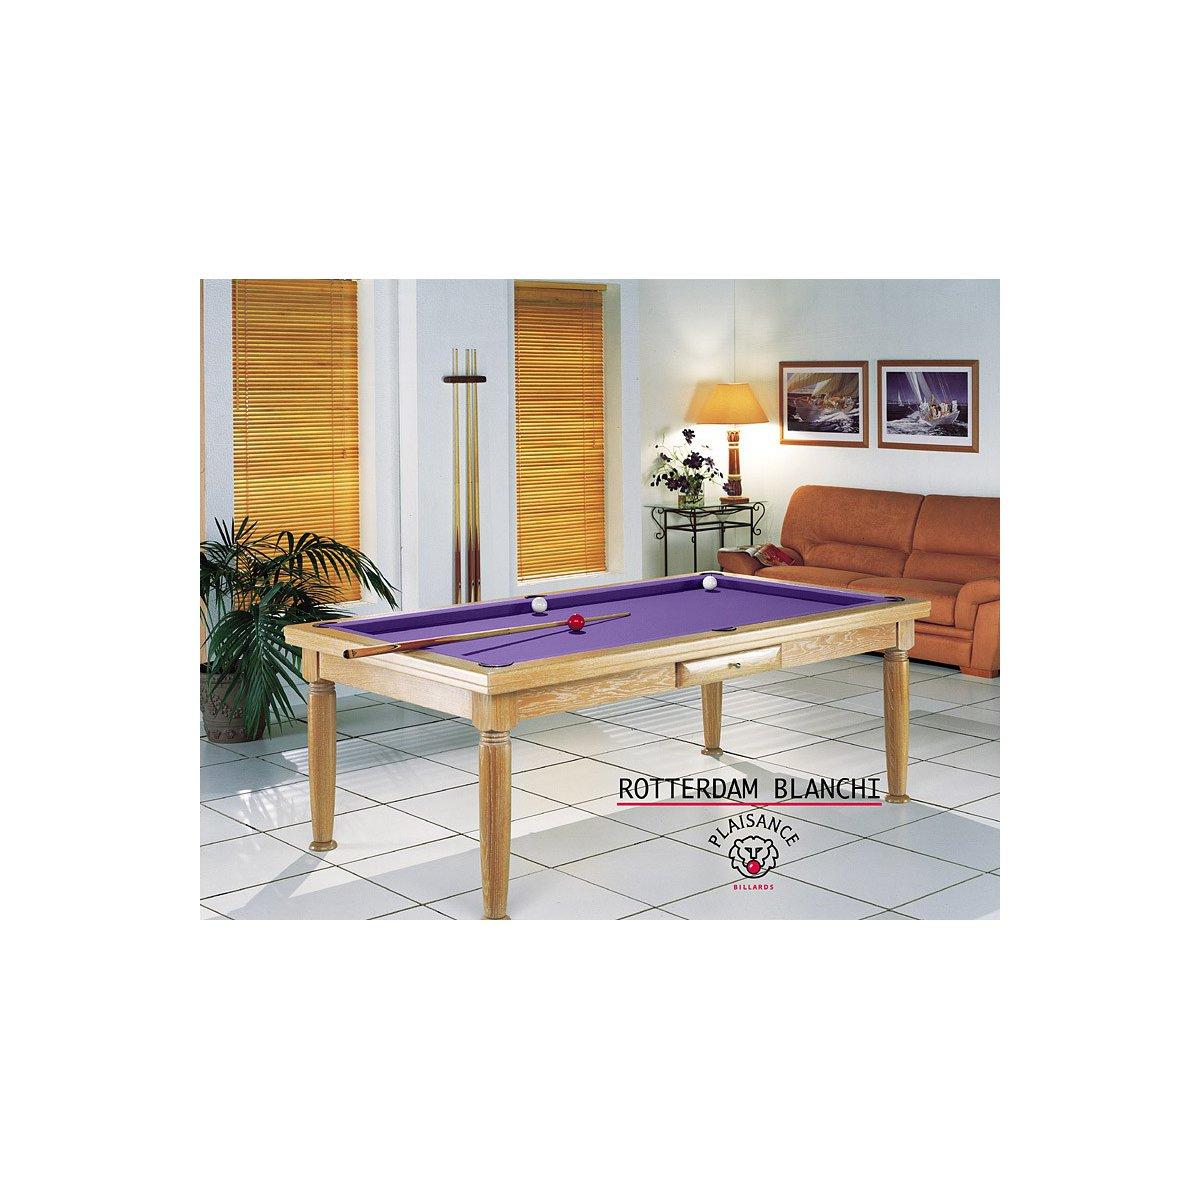 billard table a manger rotterdam blanchi. Black Bedroom Furniture Sets. Home Design Ideas